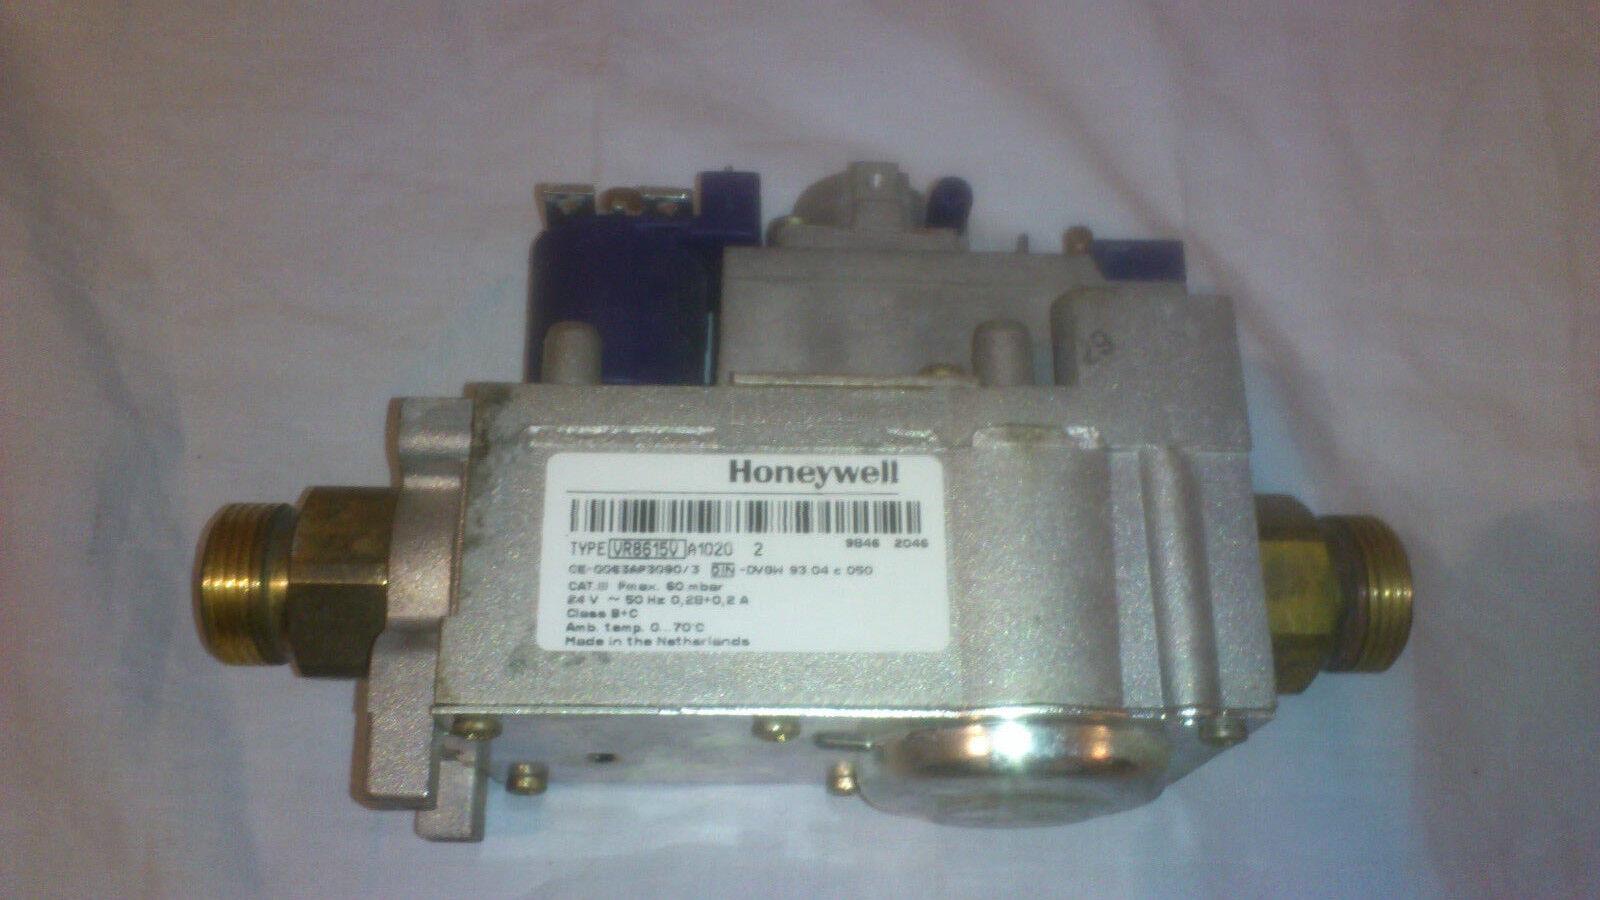 Honeywell Gasarmatur Typ VR8615V / VR 8615 V A1020 Gaskombiregler Buderus GB 112